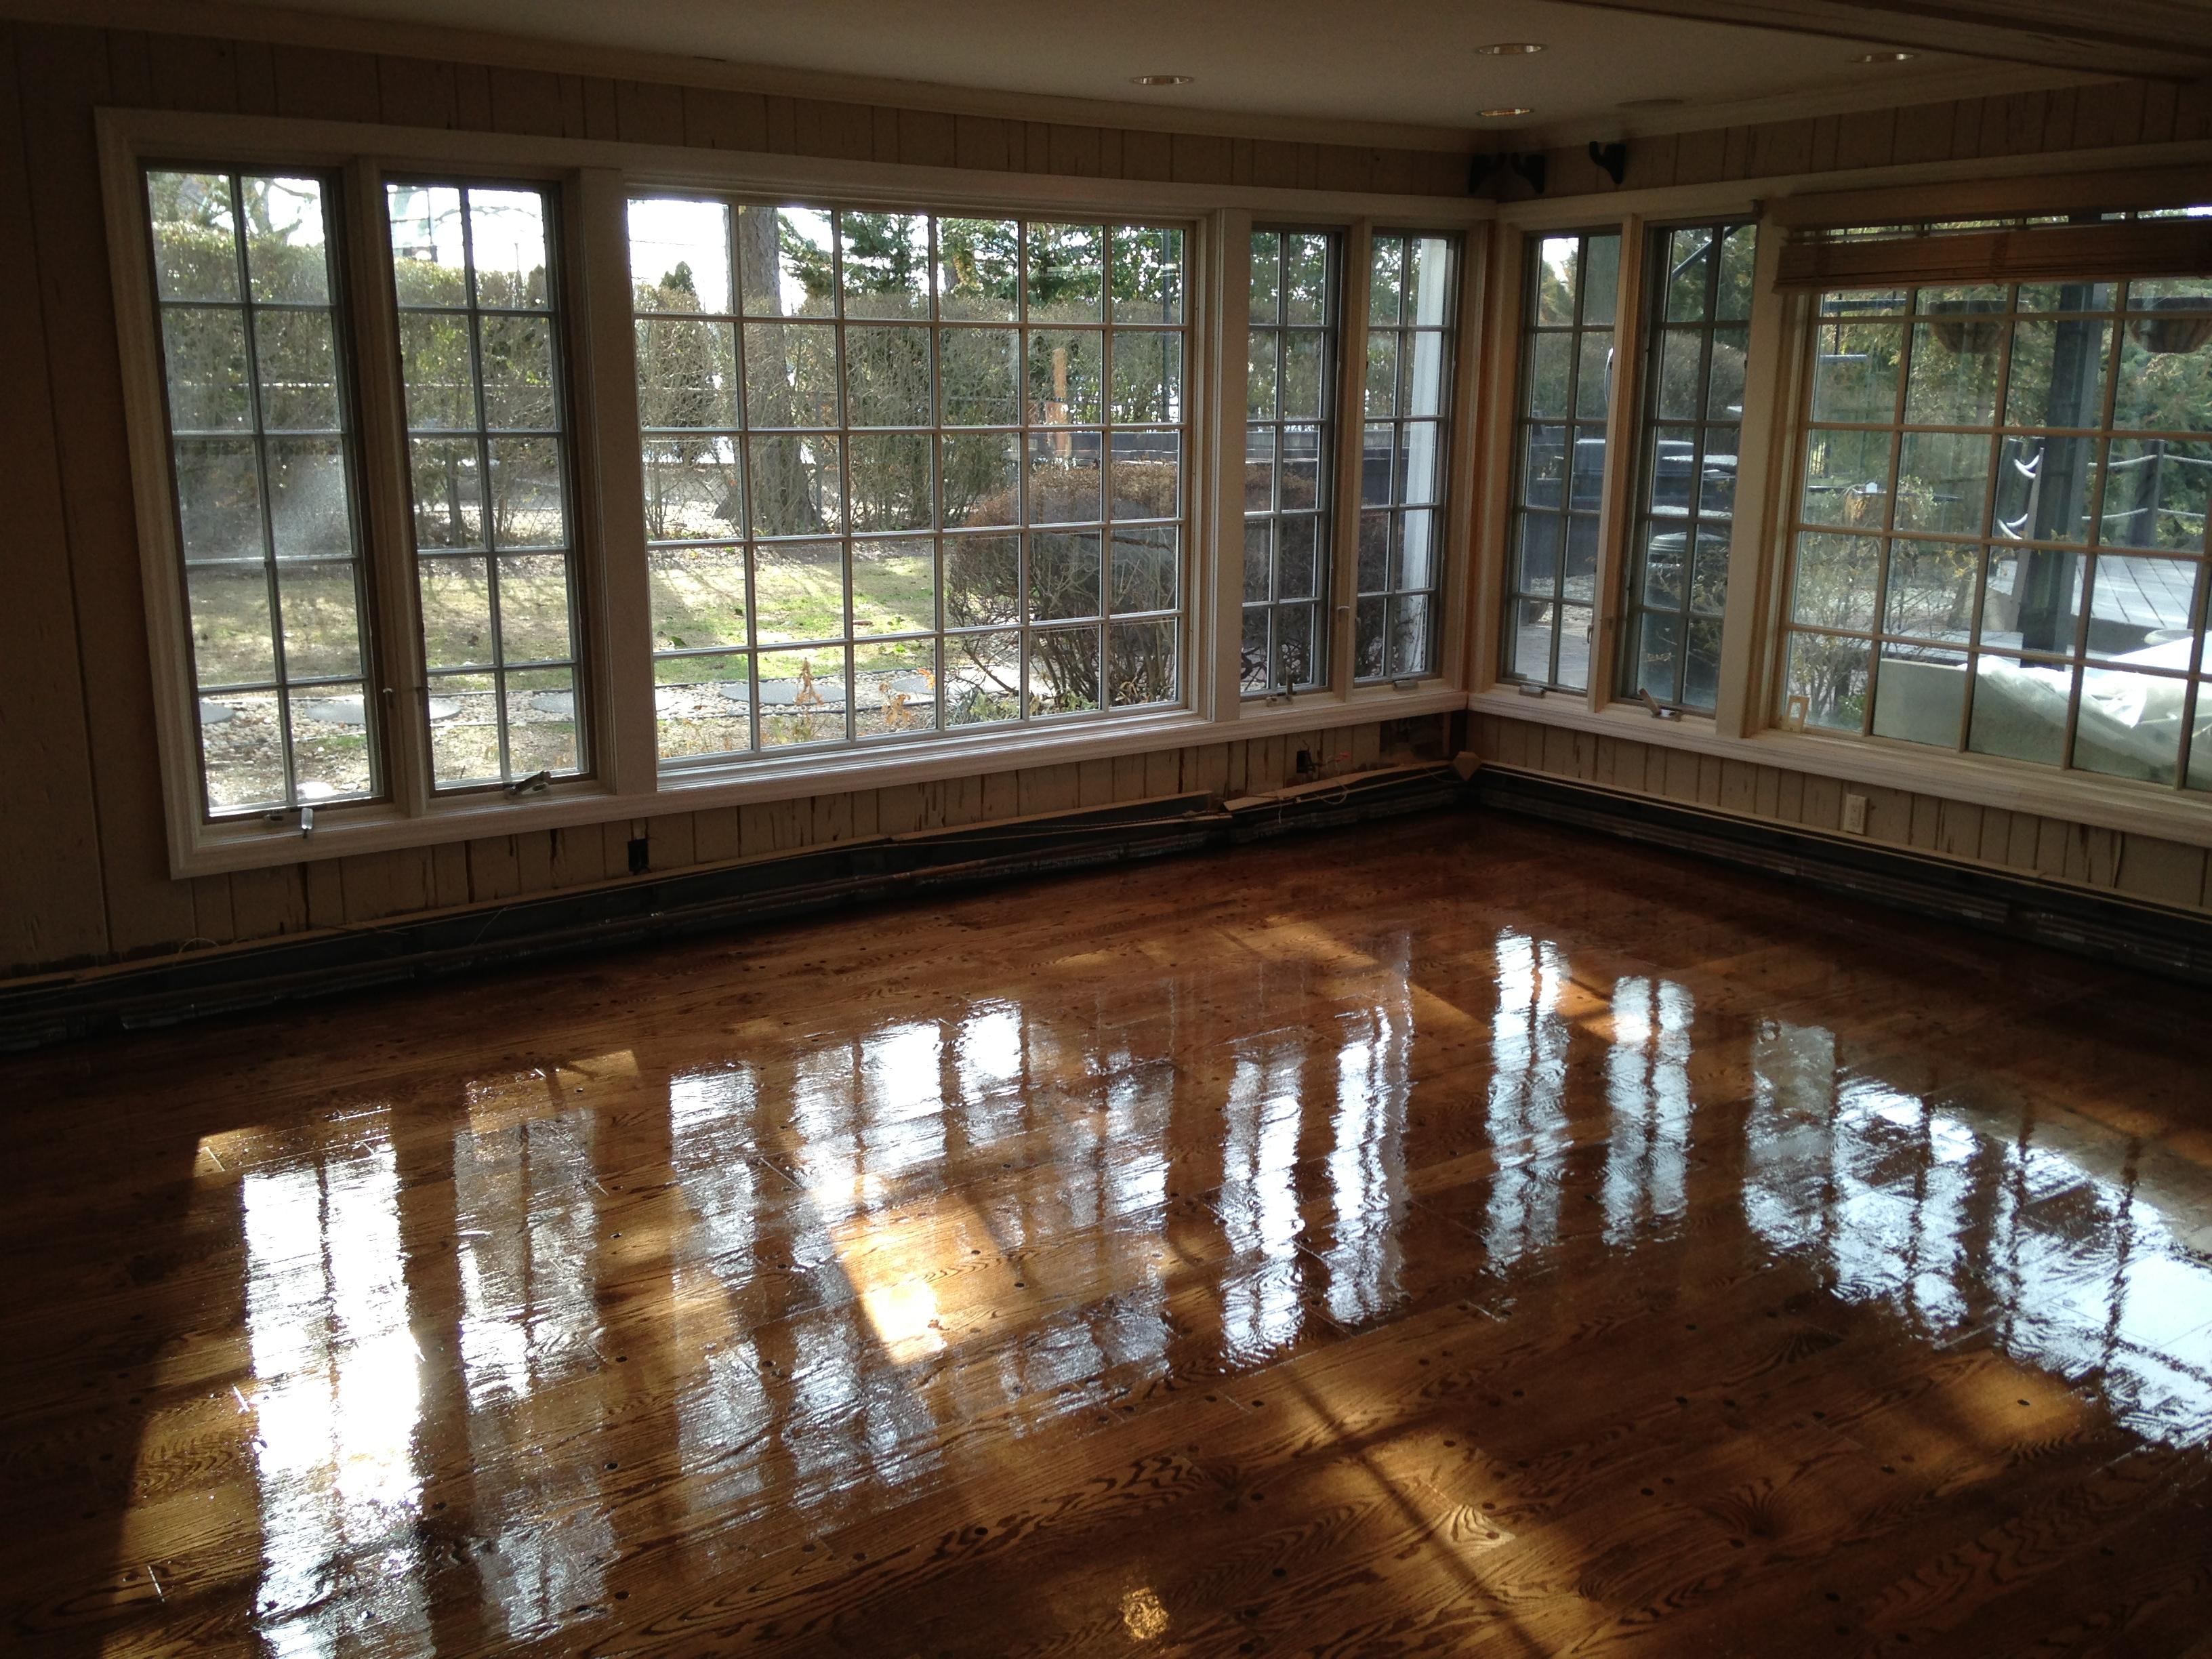 ... New Again | Go Green Floors - Eco Friendly Hardwood Flooring Solutions